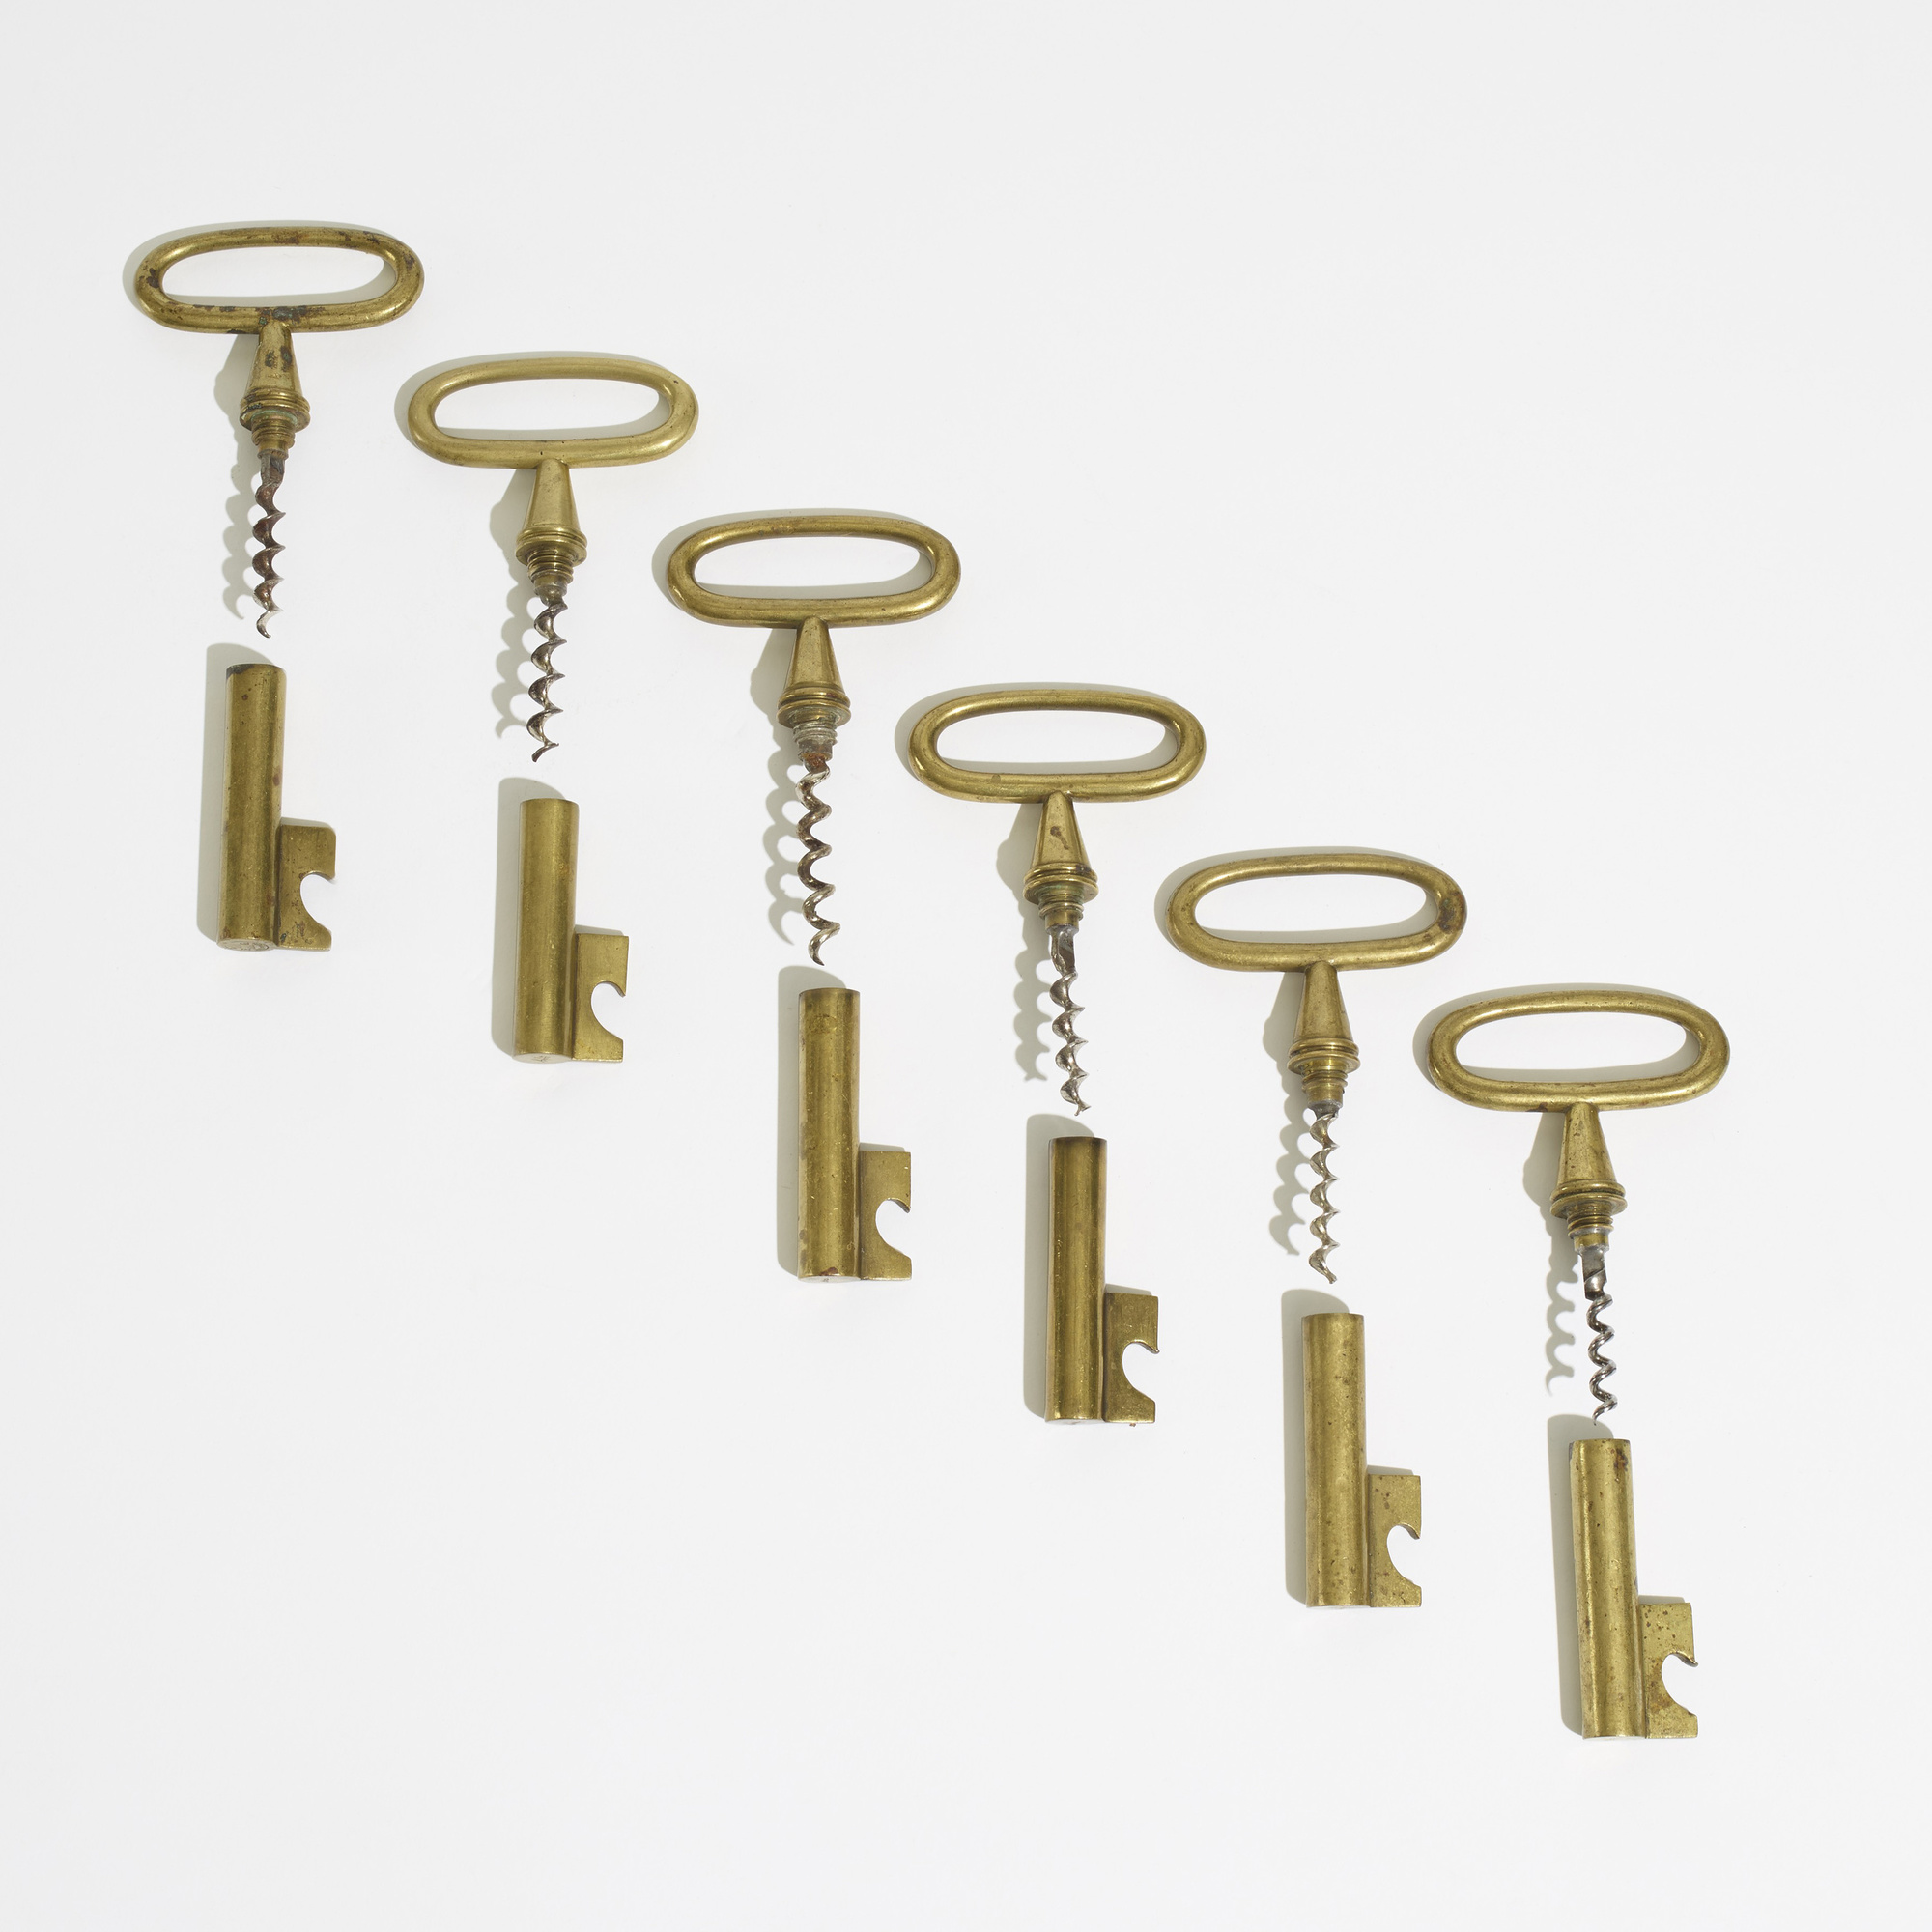 208: Carl Auböck II / corkscrews, set of six (2 of 3)